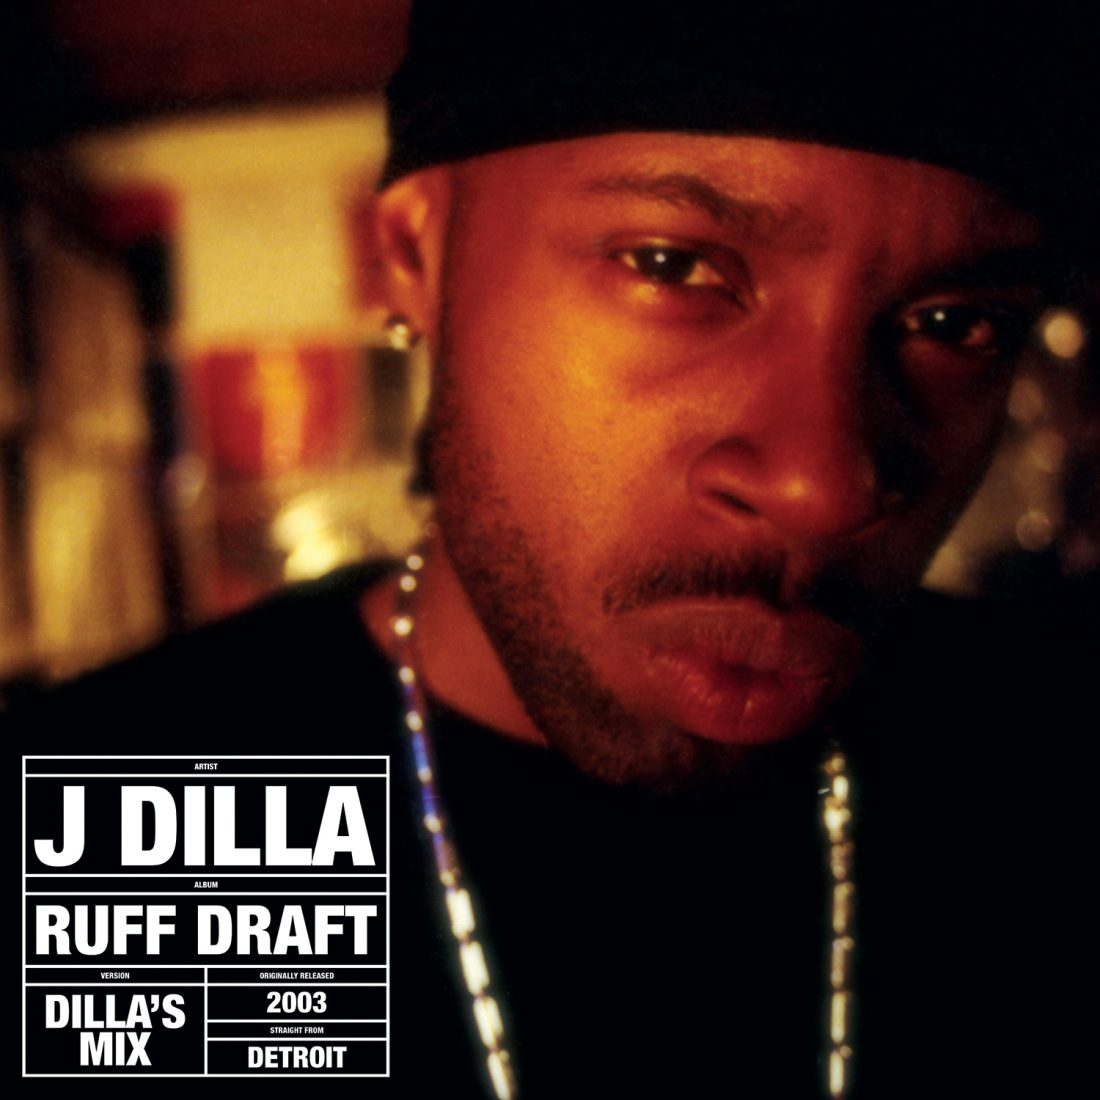 Dilla-RUFFDRAFT-web1500-j-dilla-vinyl